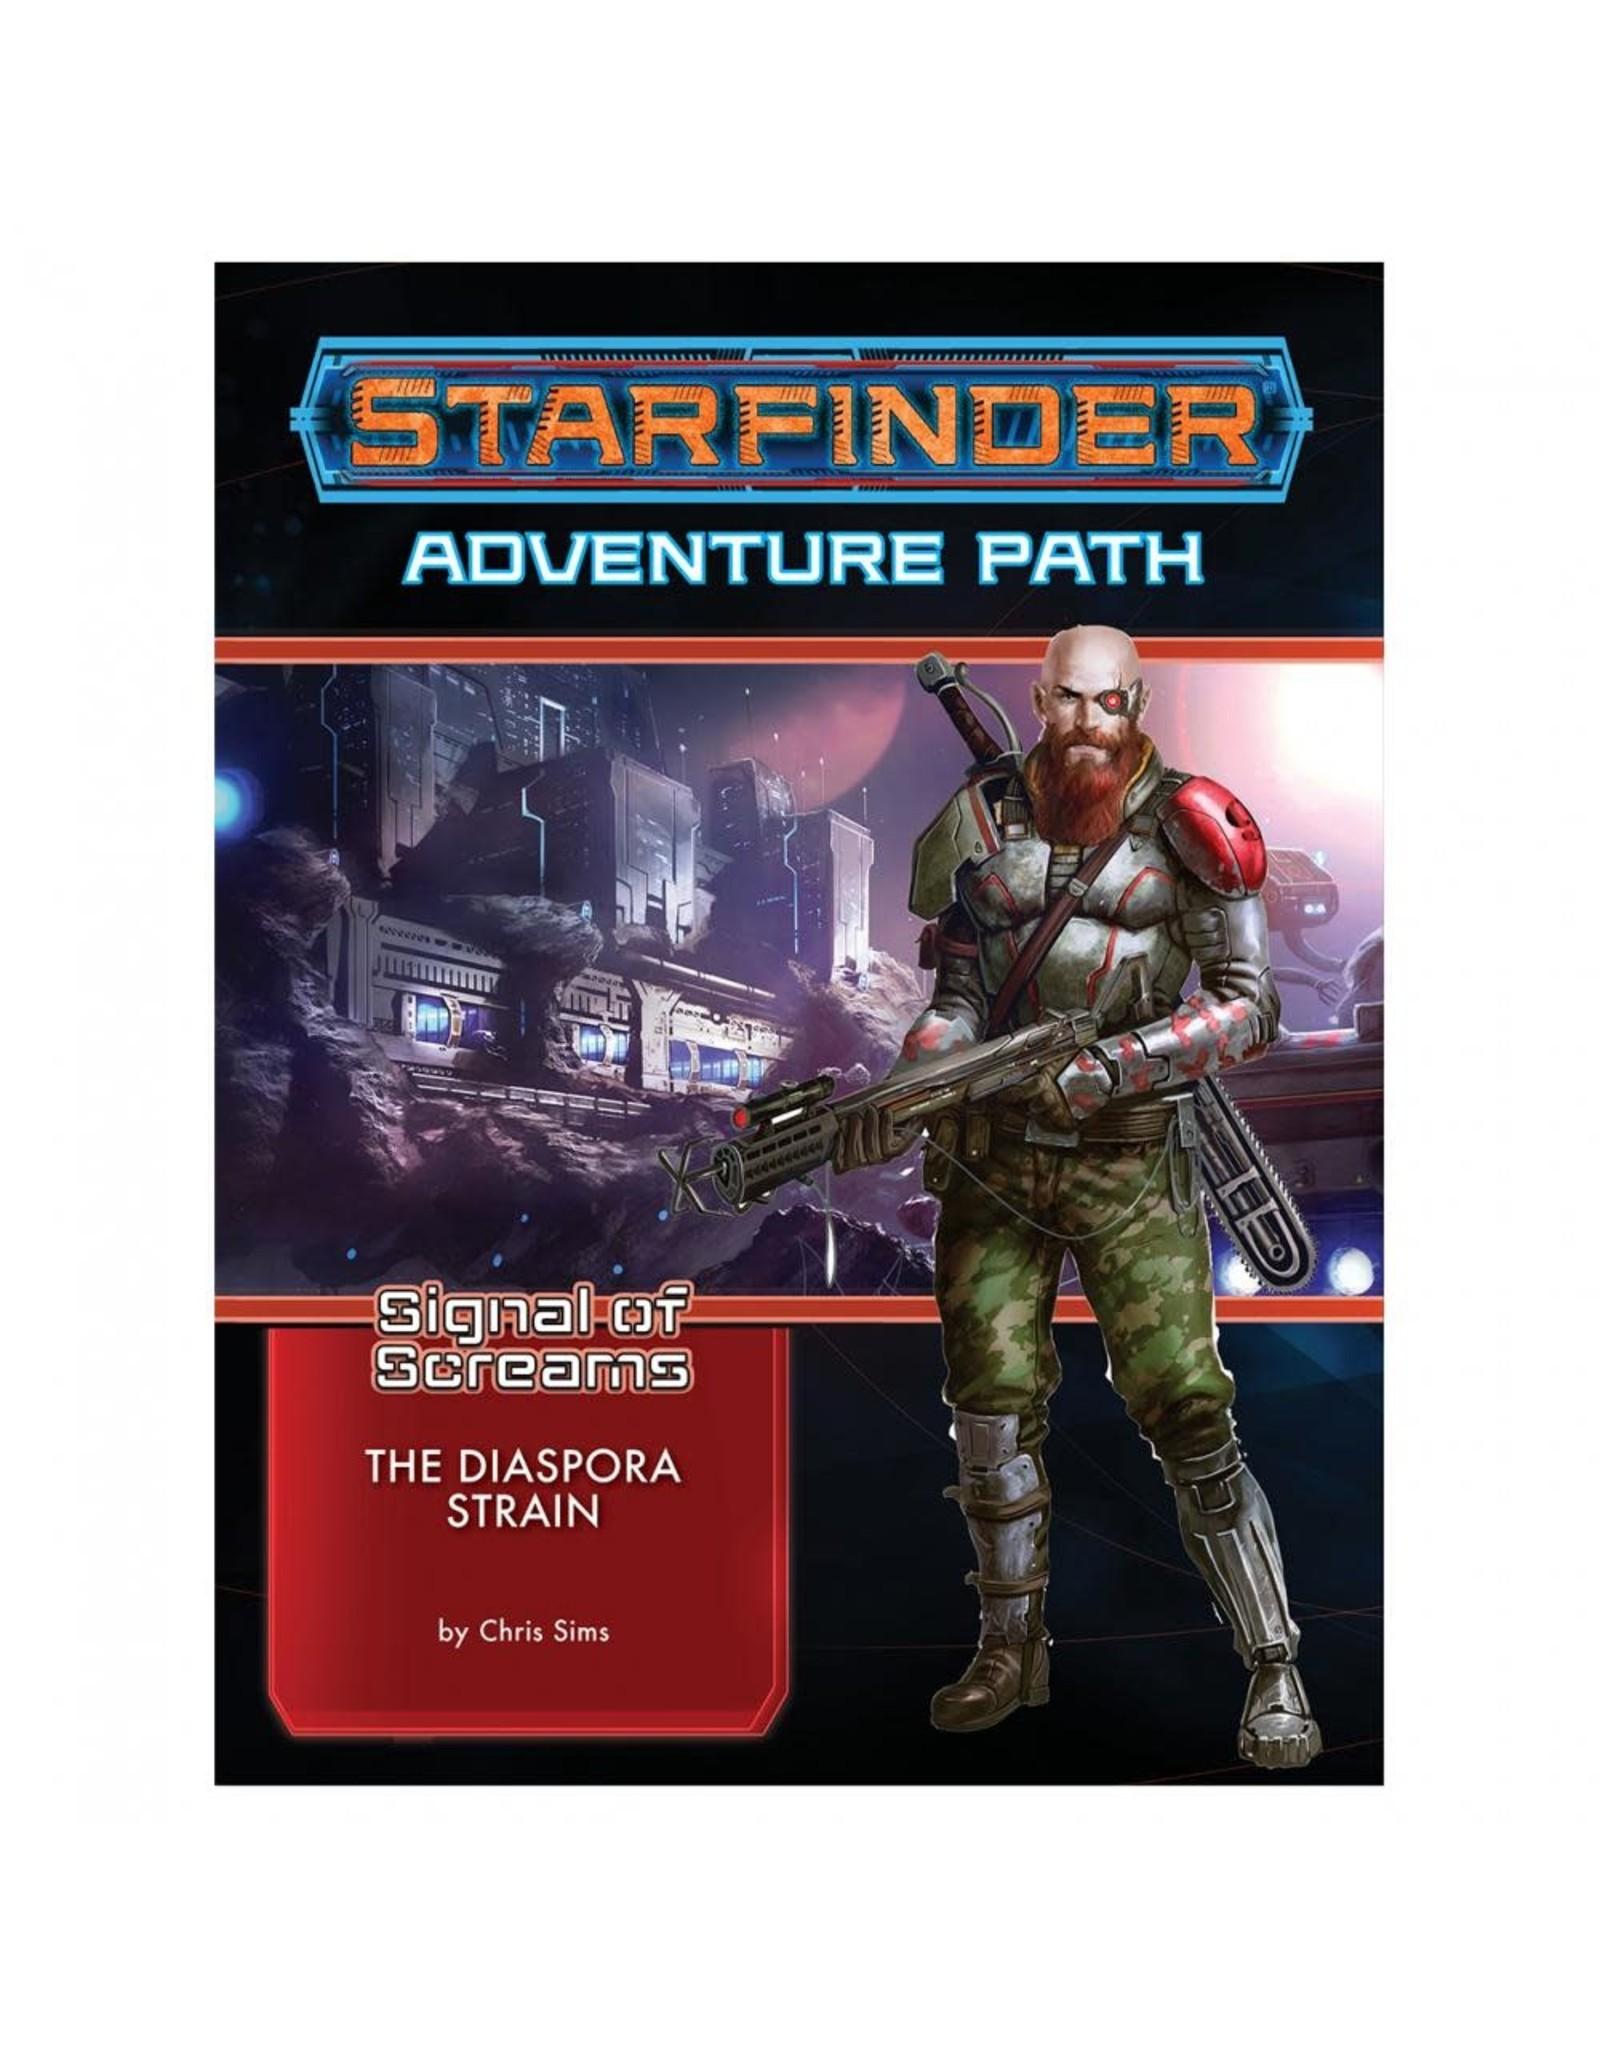 Starfinder RPG: Adventure Path - Signal of Screams 1 - The Diaspora